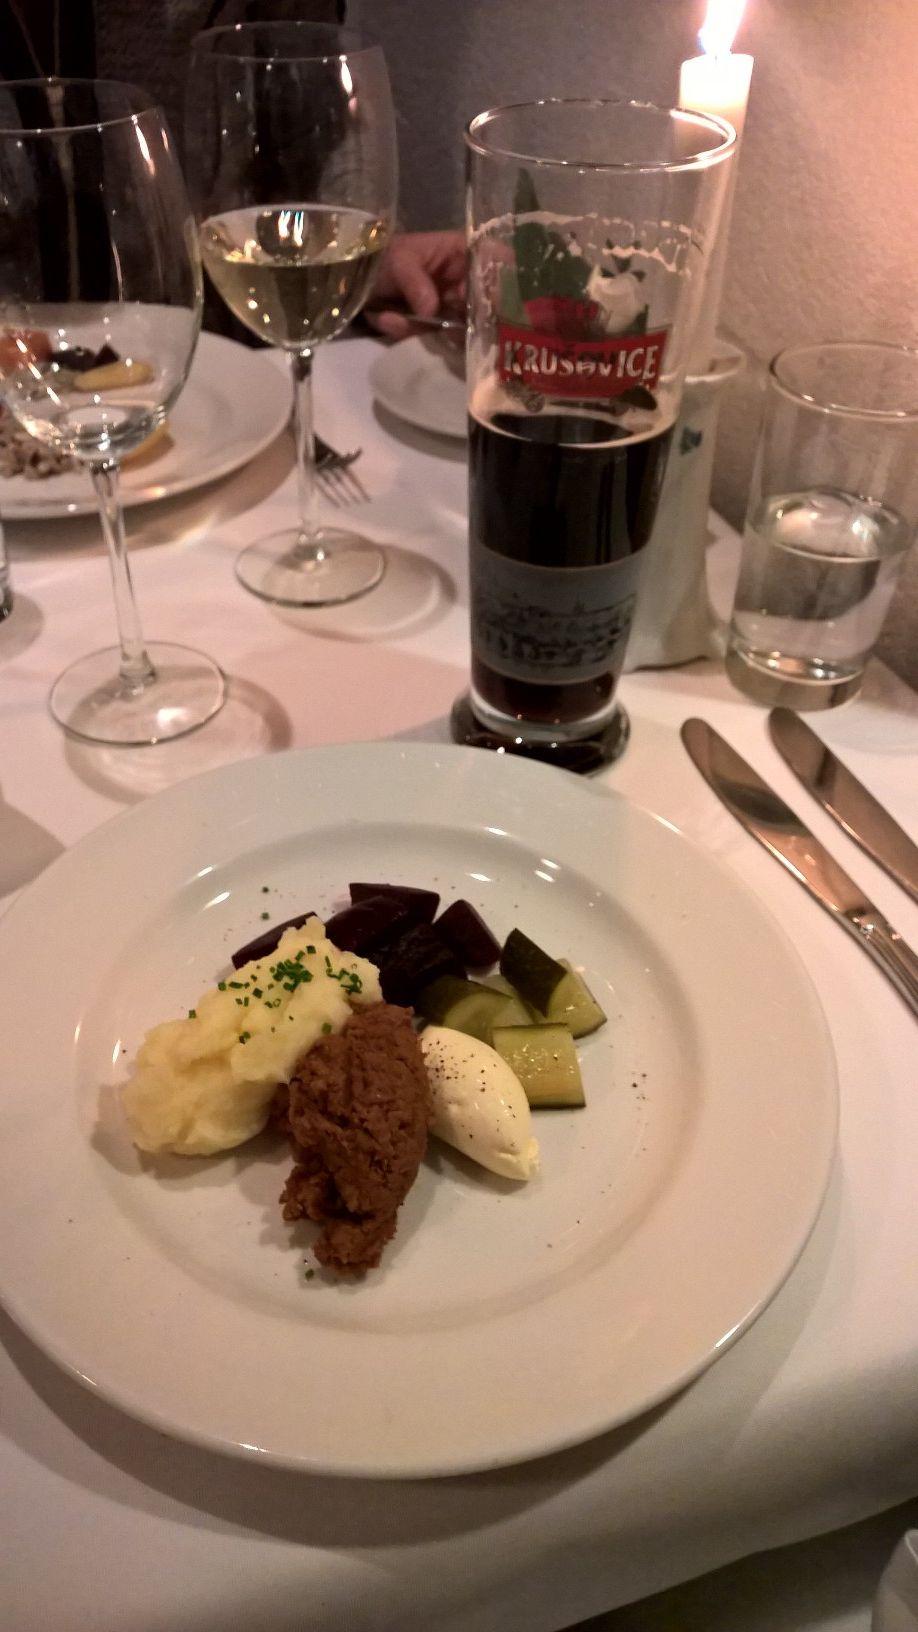 Ravintola Heinätori, Tampere: Vorschmack ja sopiva juoma